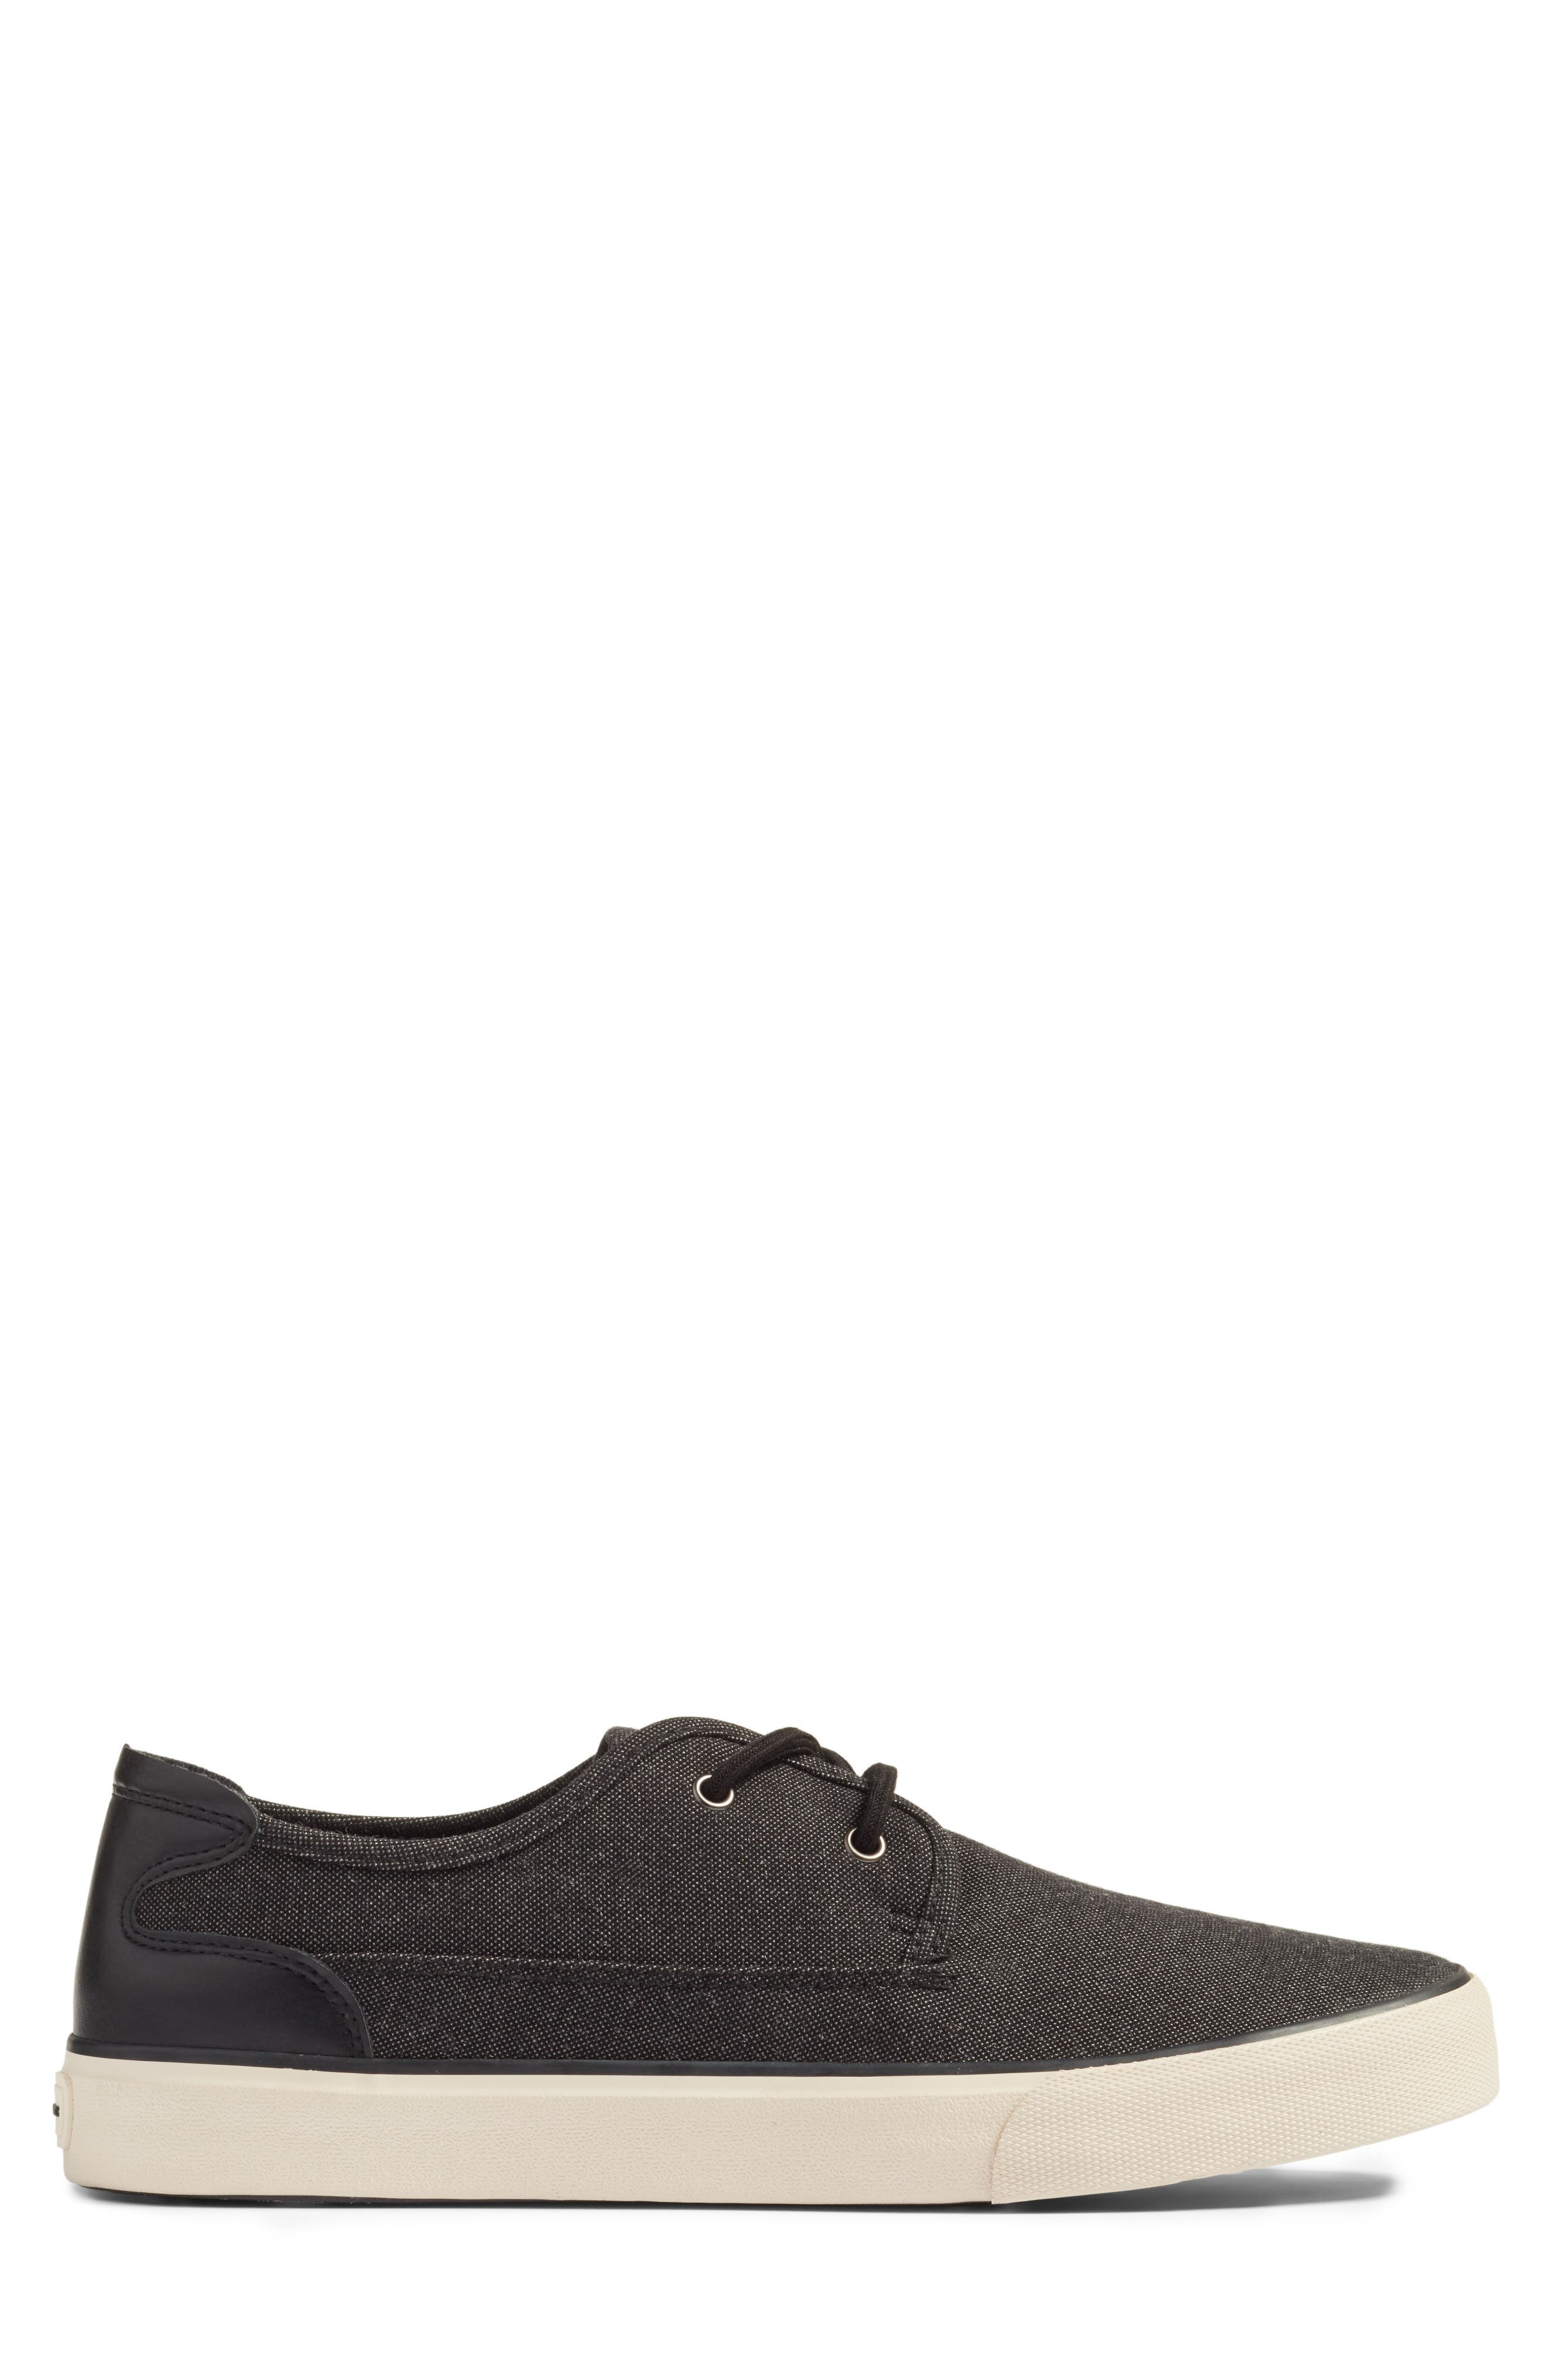 Morris Sneaker,                             Alternate thumbnail 3, color,                             Black/ Bone